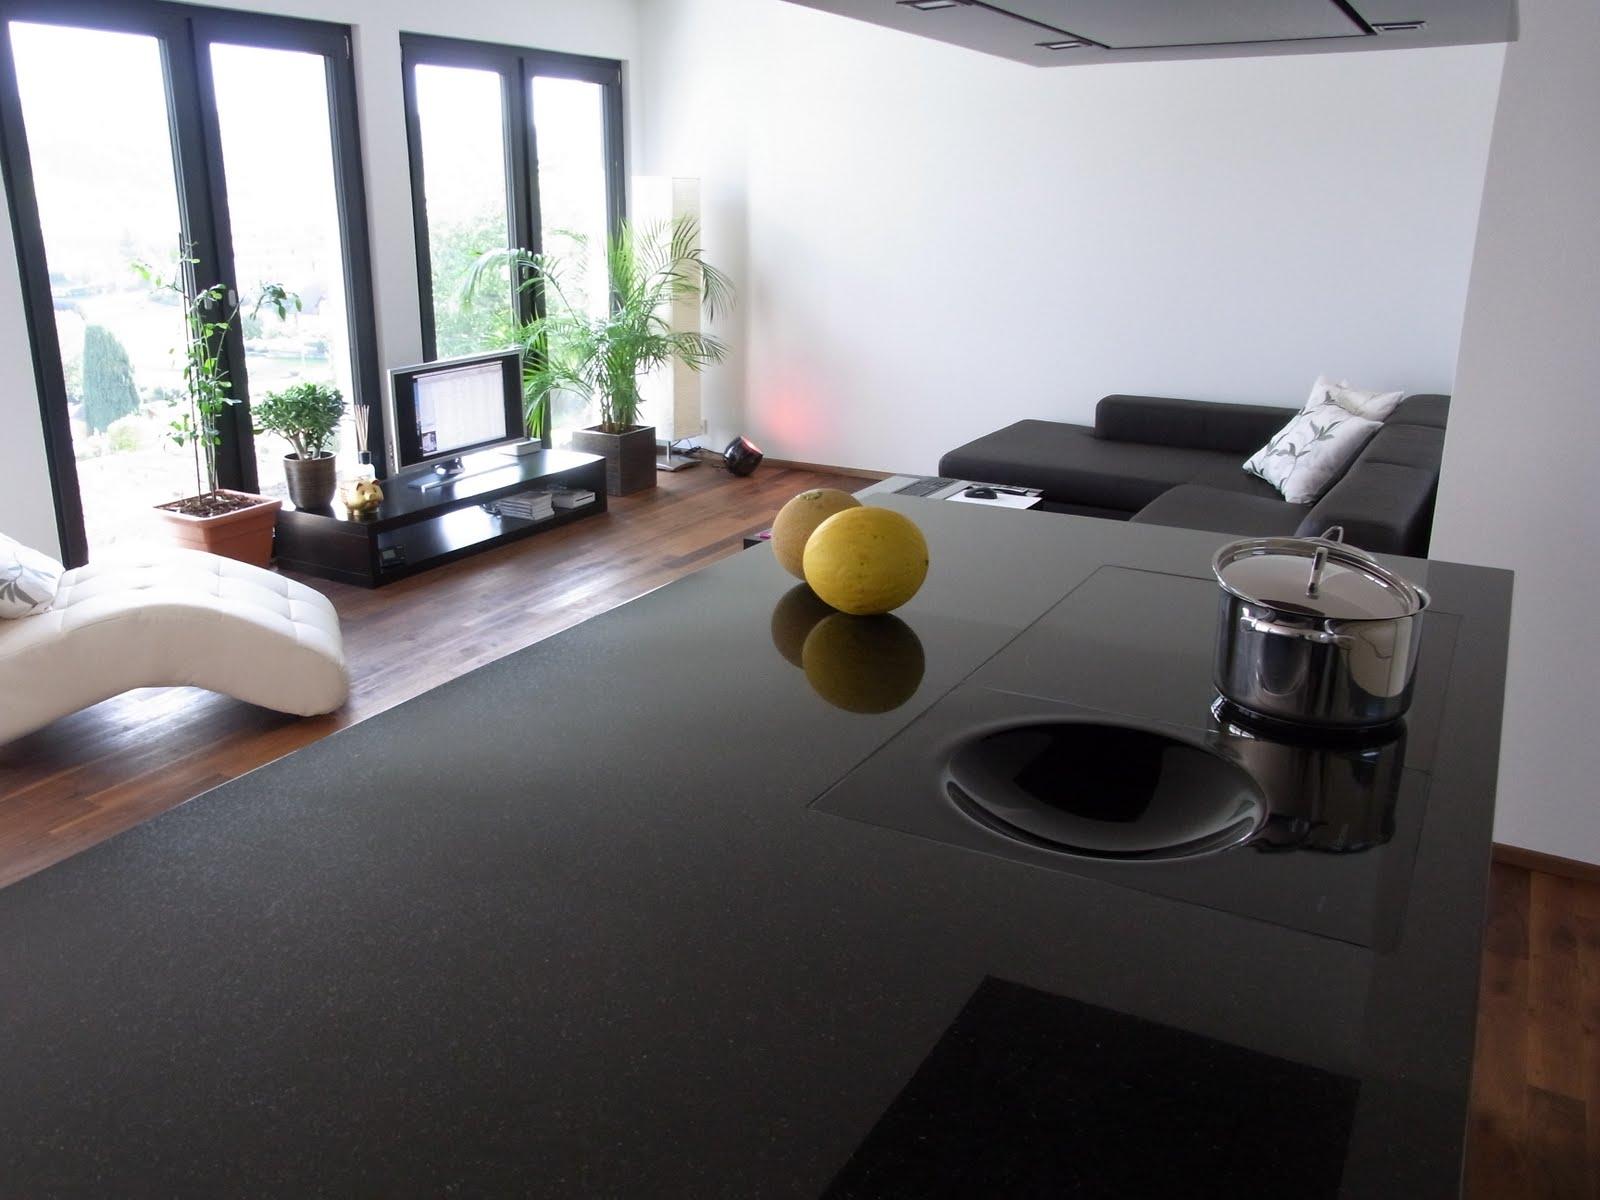 mein hanse haus. Black Bedroom Furniture Sets. Home Design Ideas